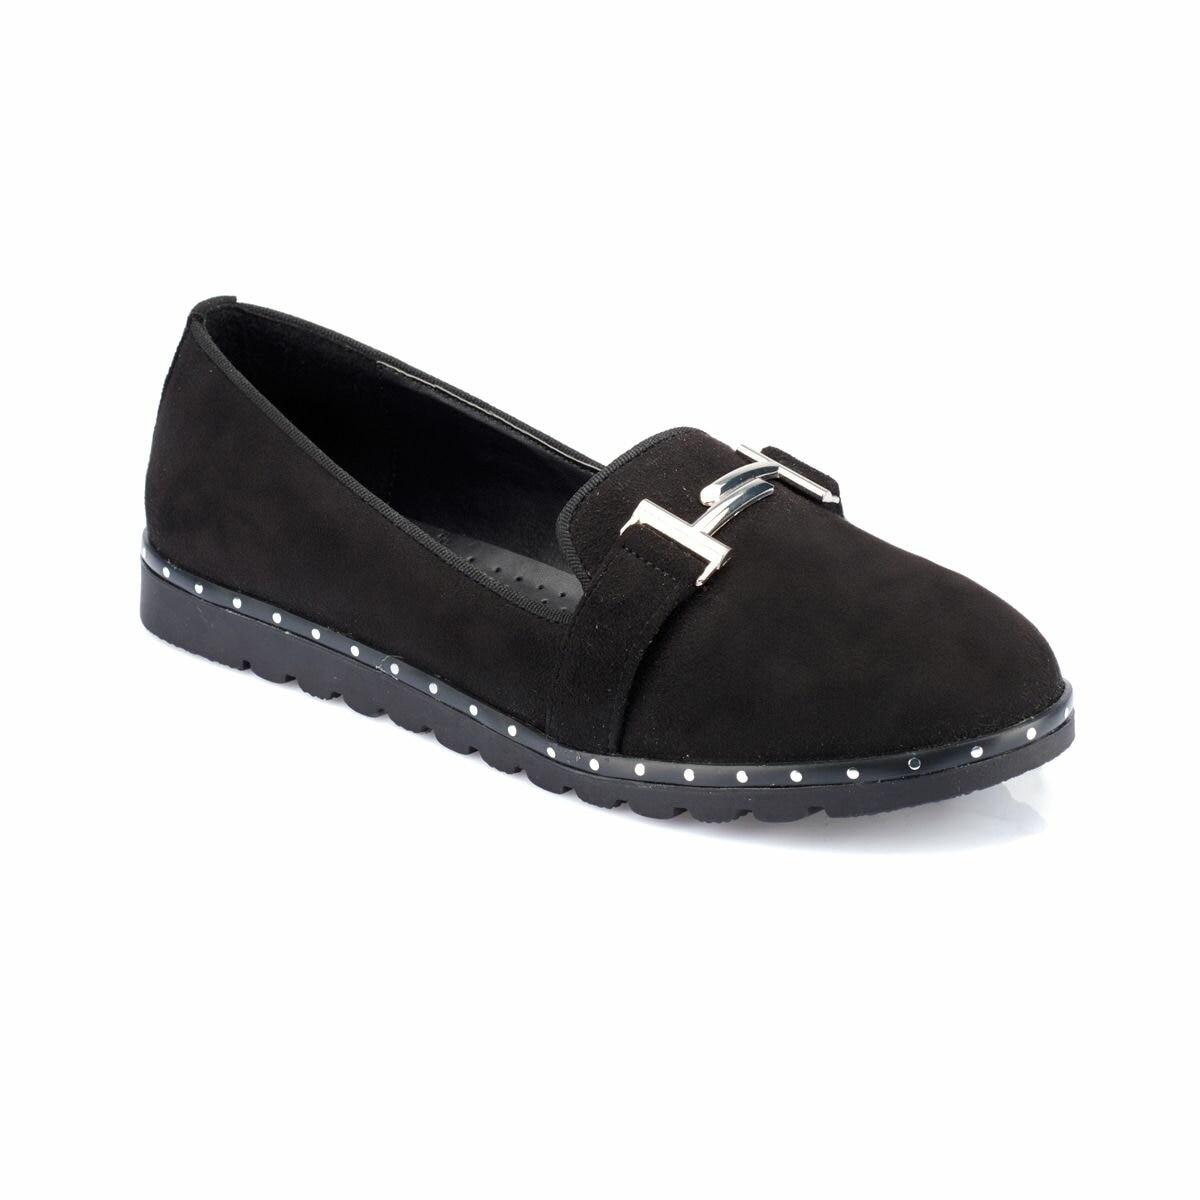 Flo 82.312041sz preto sapatos femininos polaris